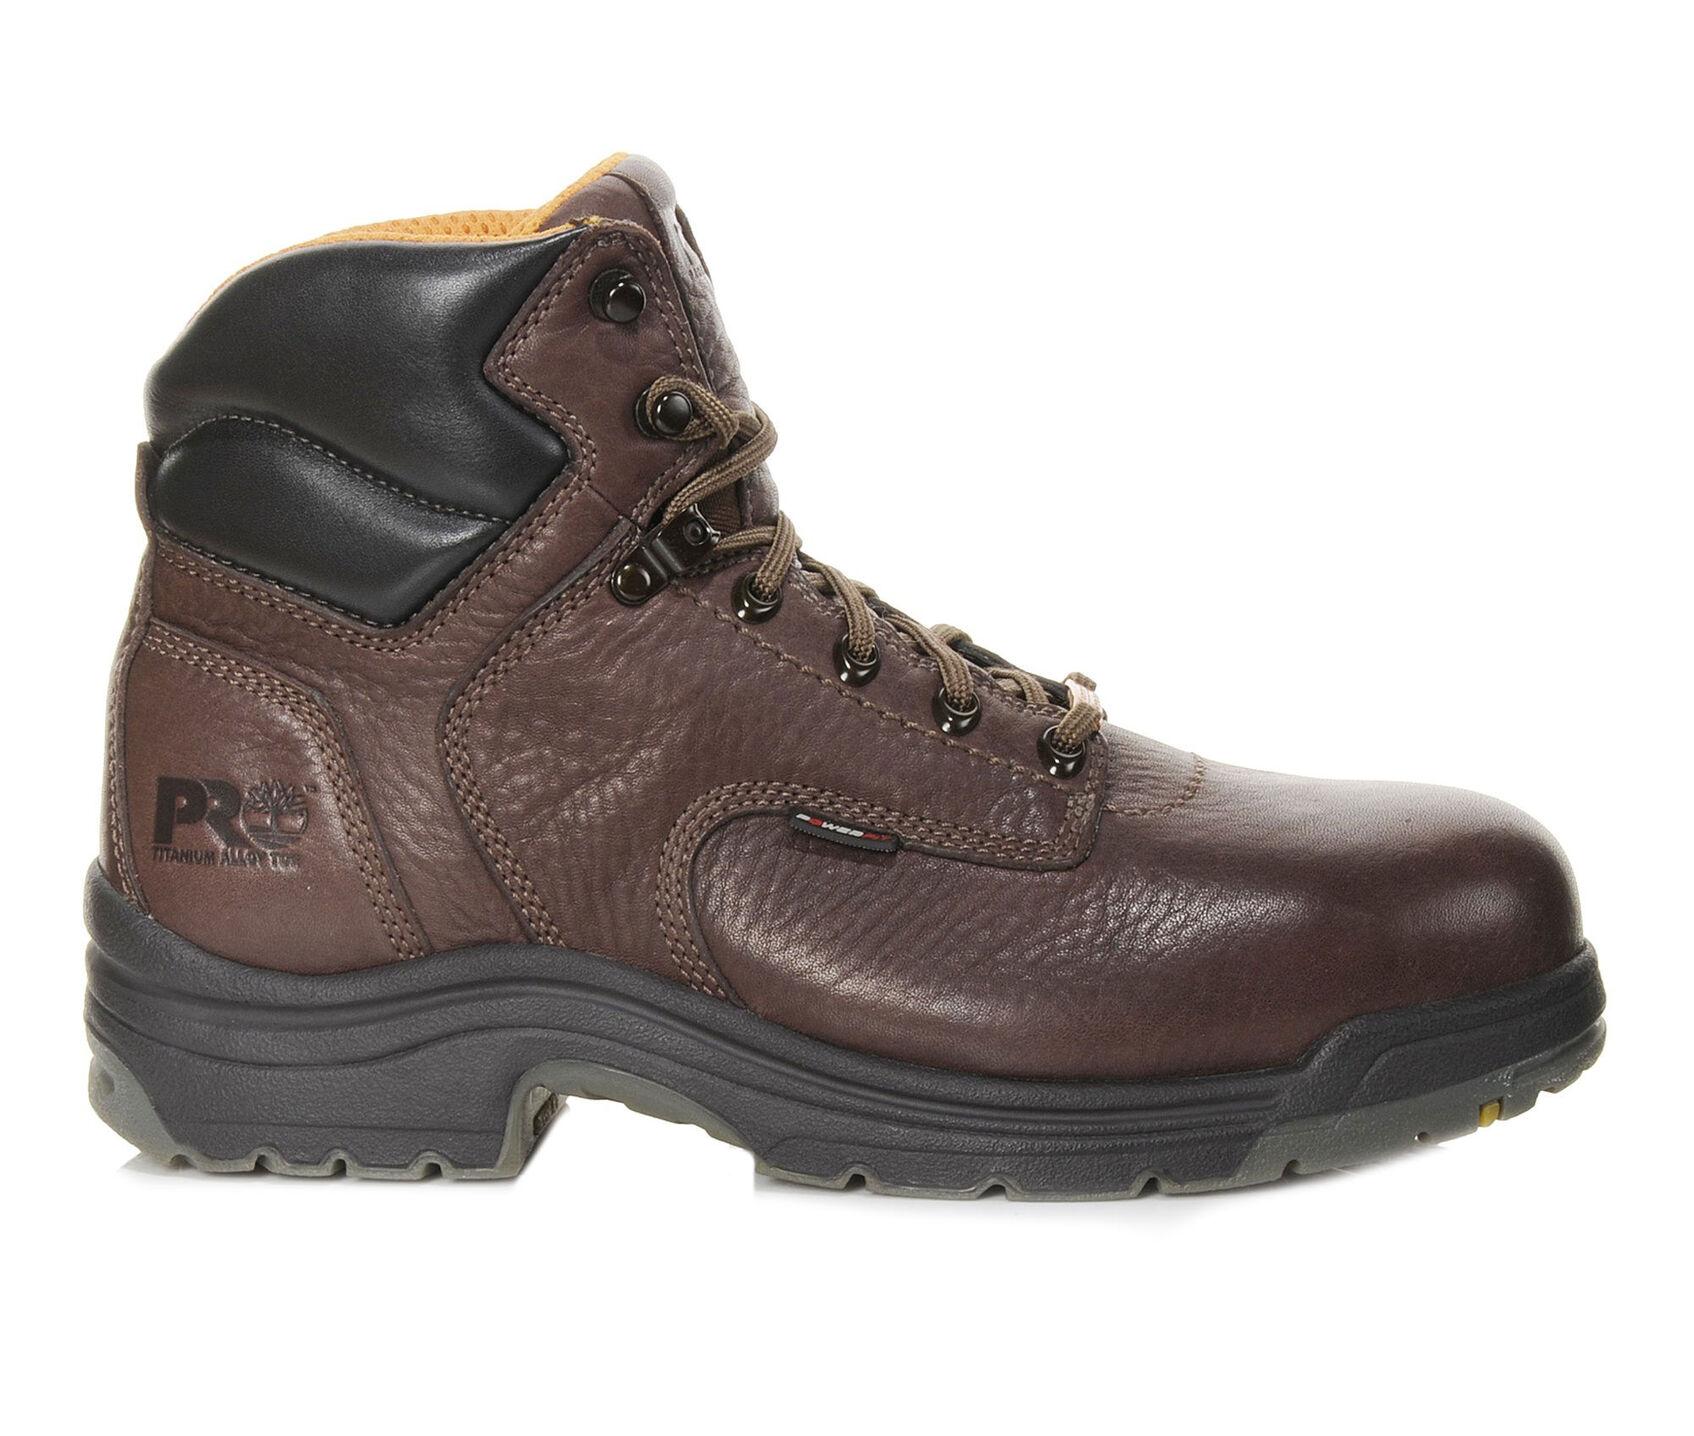 c364a9d0c4d Men's Timberland Pro Titan 6in 26063 Alloy Toe Work Boots | Shoe ...